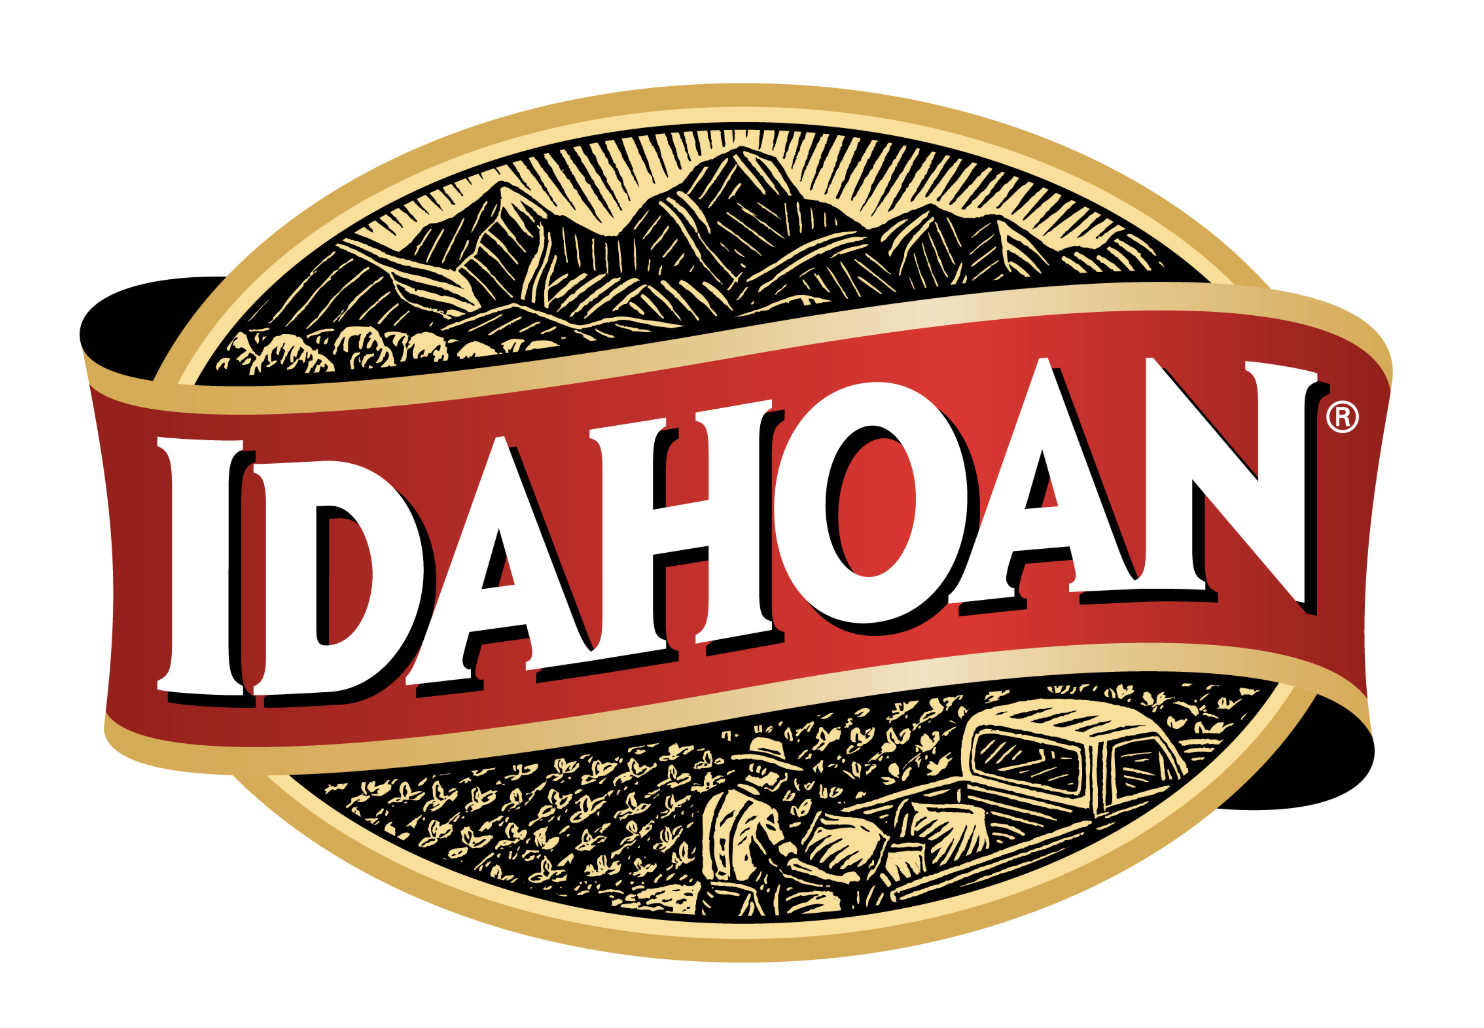 Idahoan.png